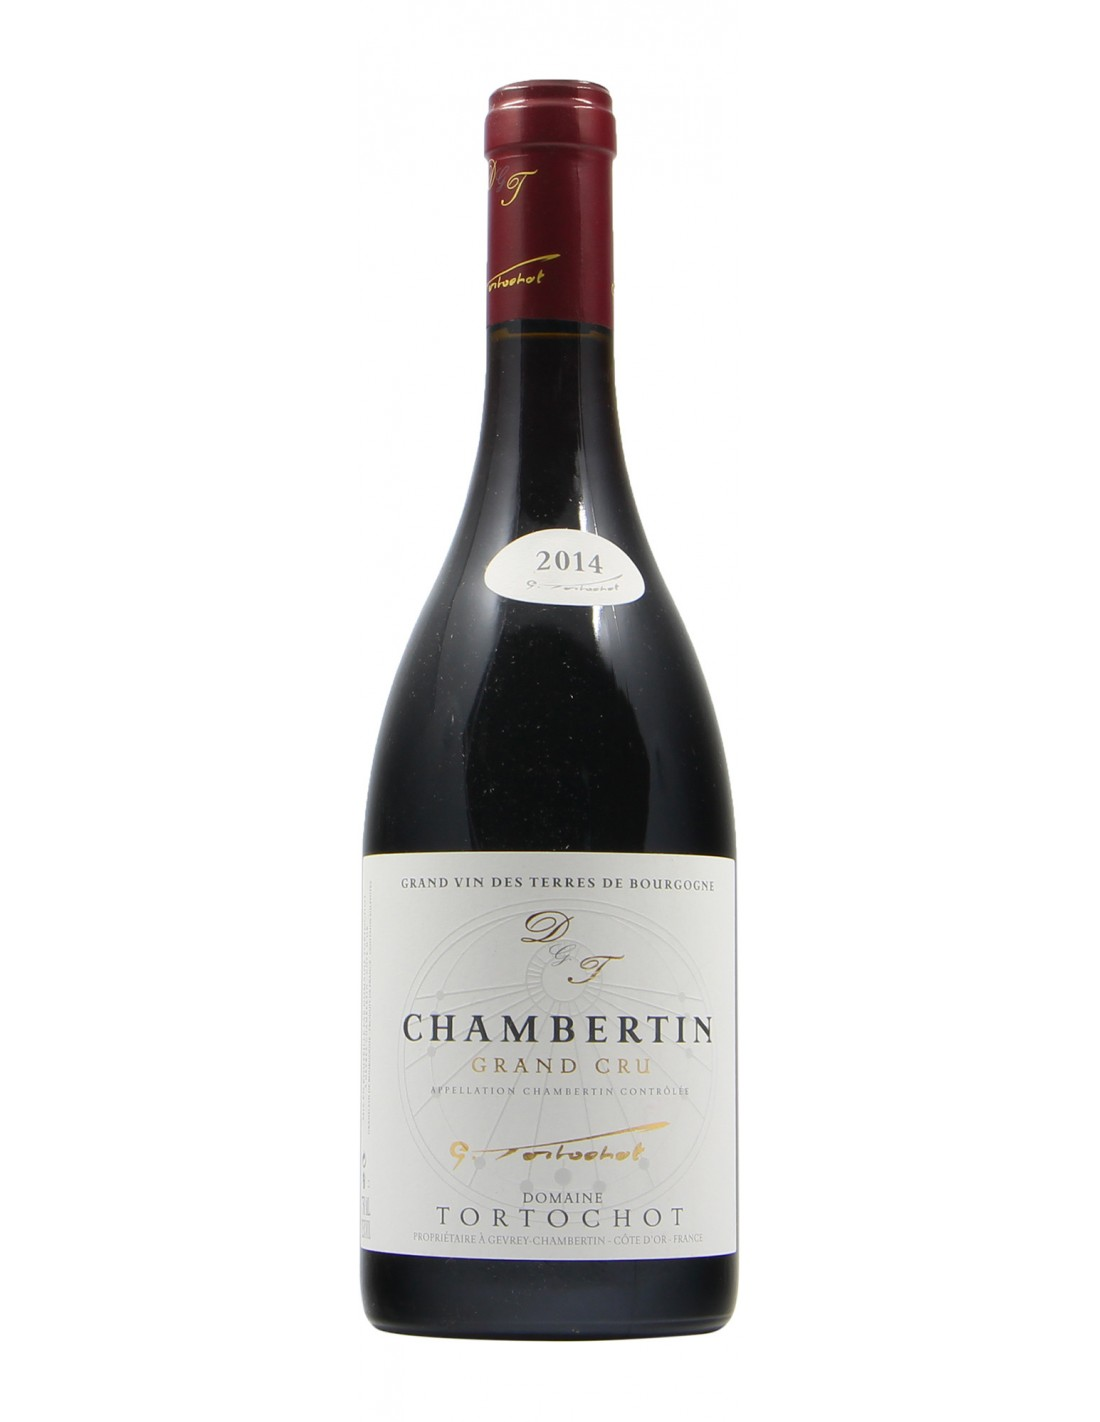 CHAMBERTIN GRAND CRU 2014 TORTOCHOT Grandi Bottiglie